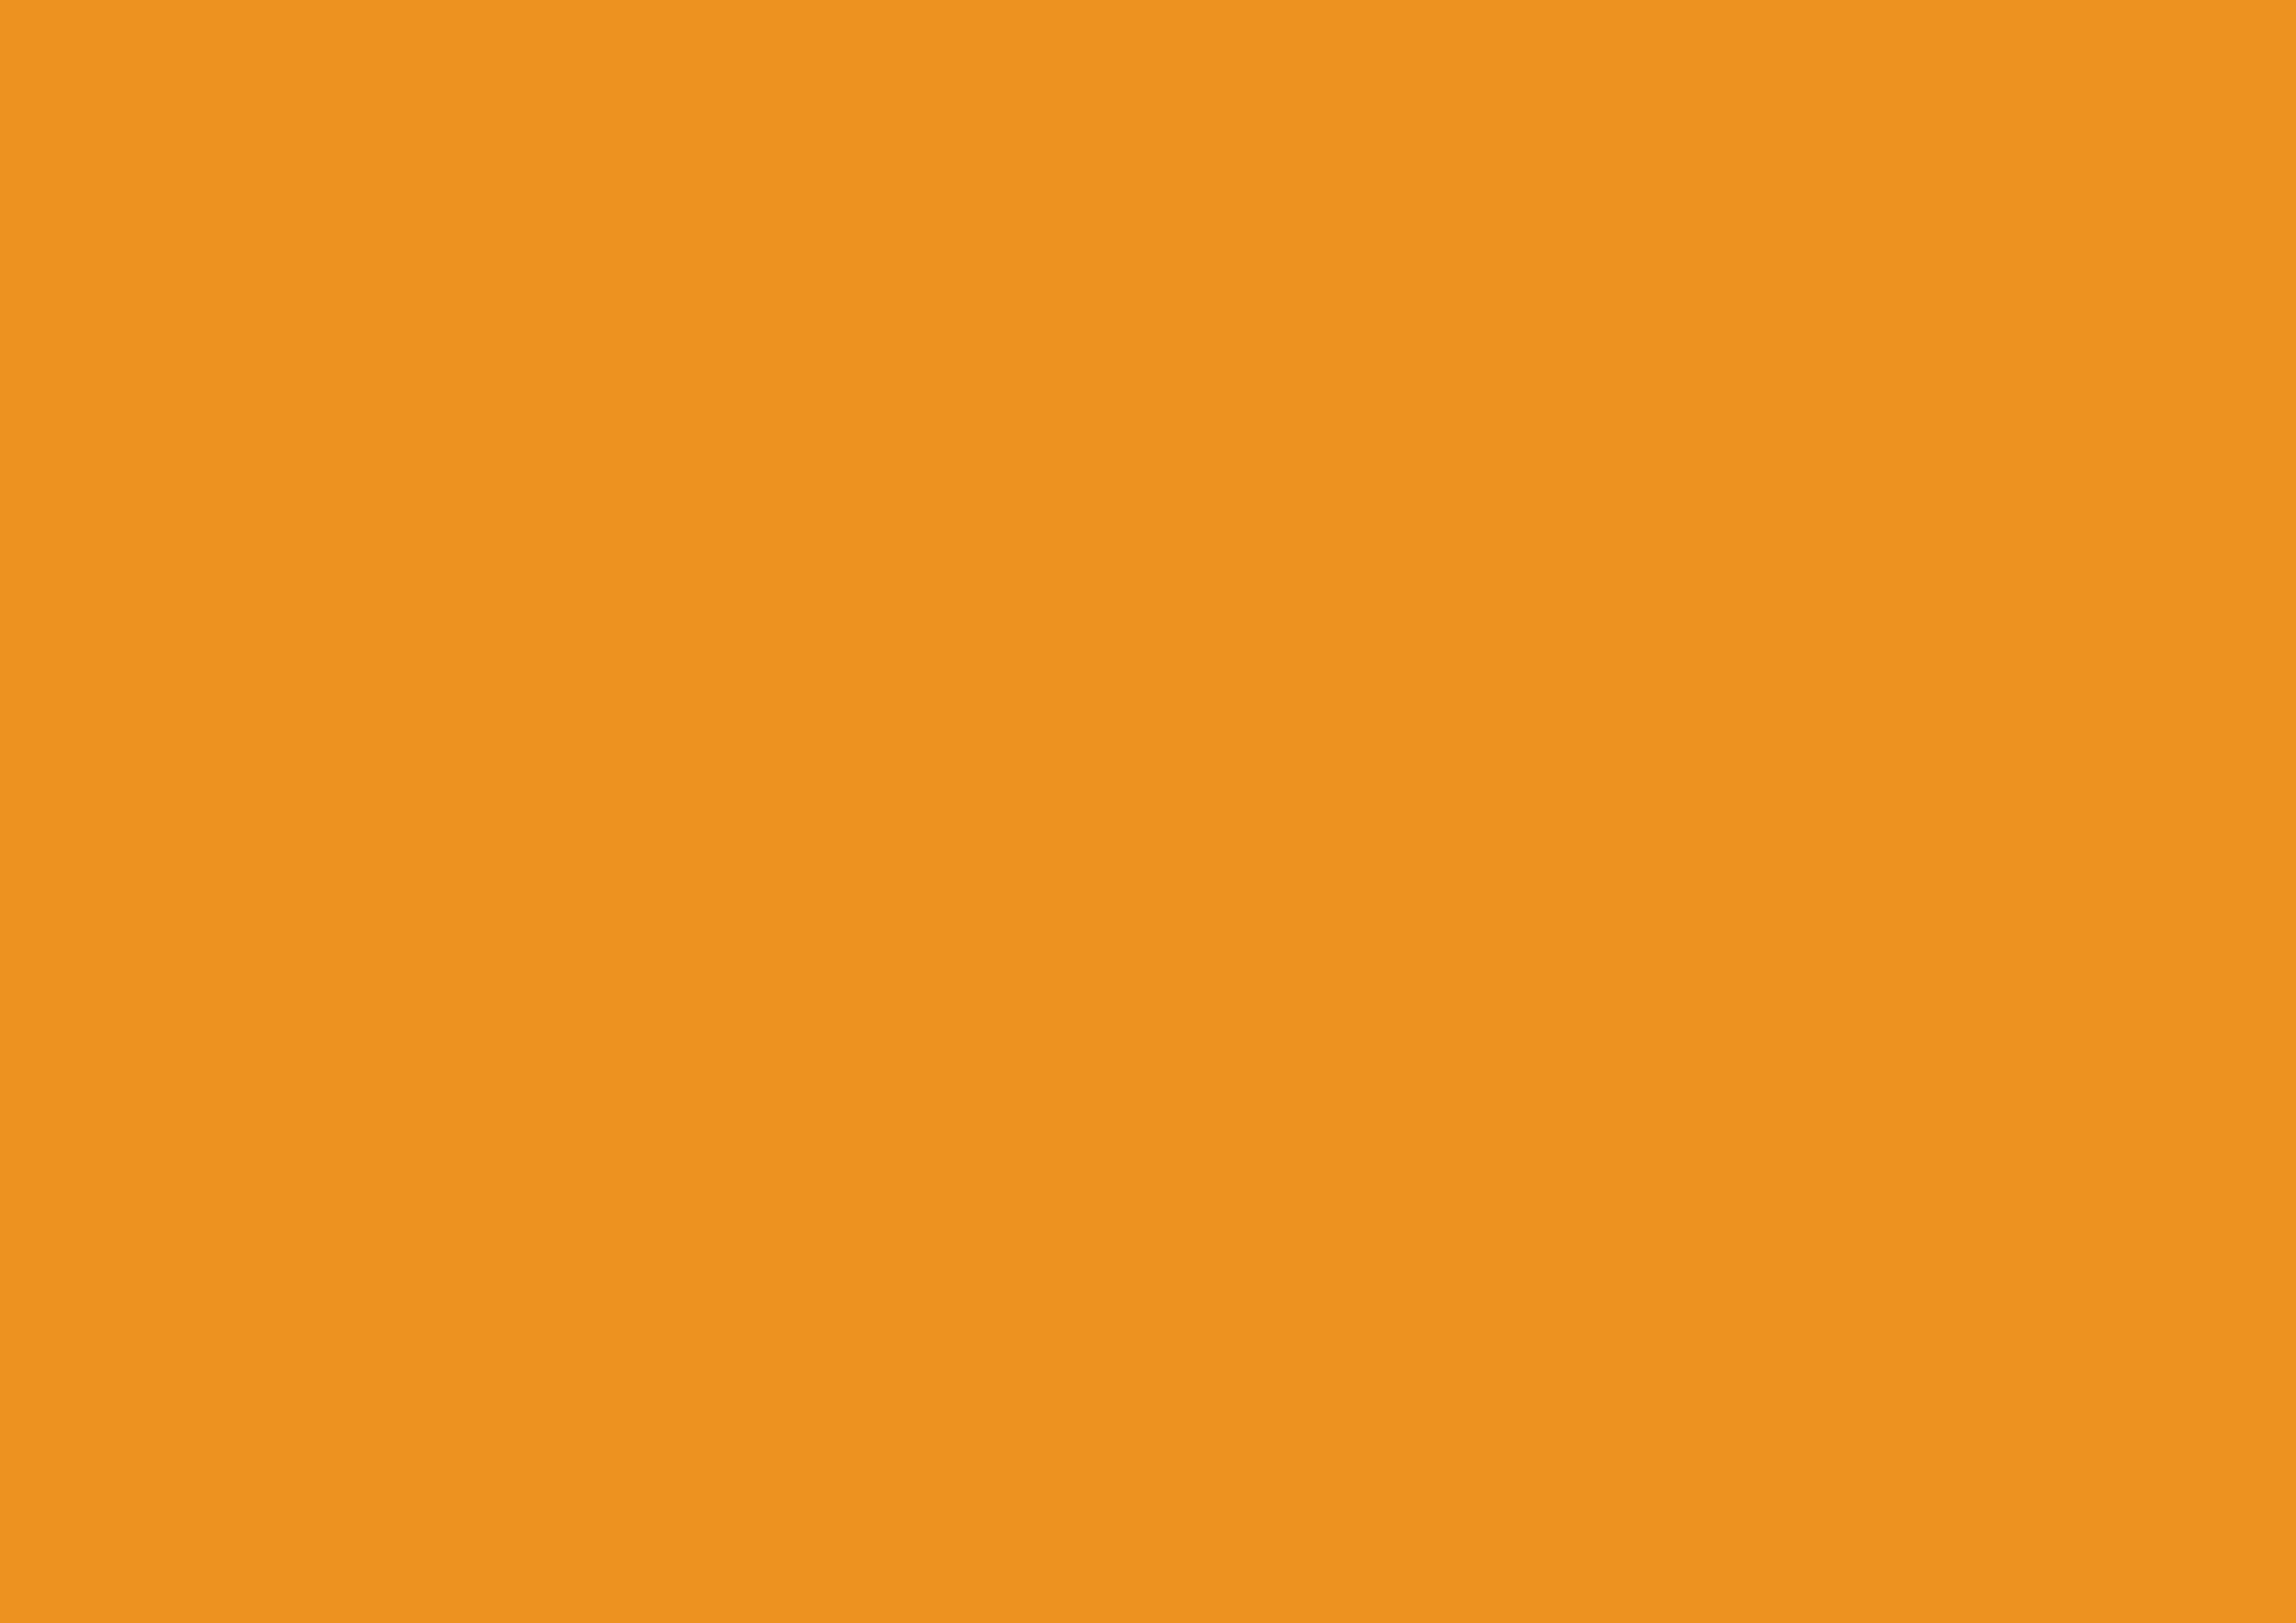 3508x2480 Carrot Orange Solid Color Background